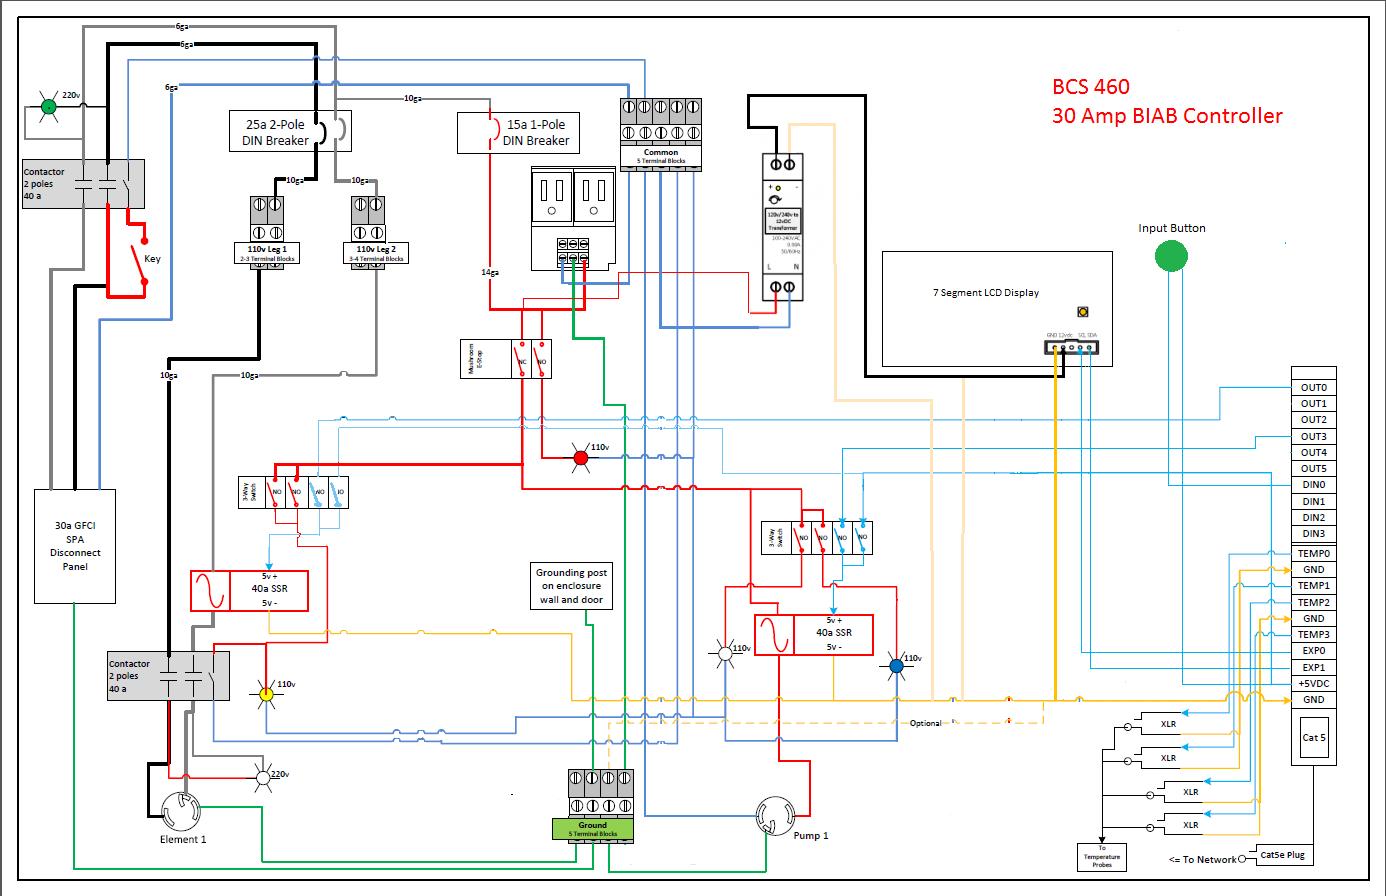 bcs 460 wiring diagram  | 1386 x 896